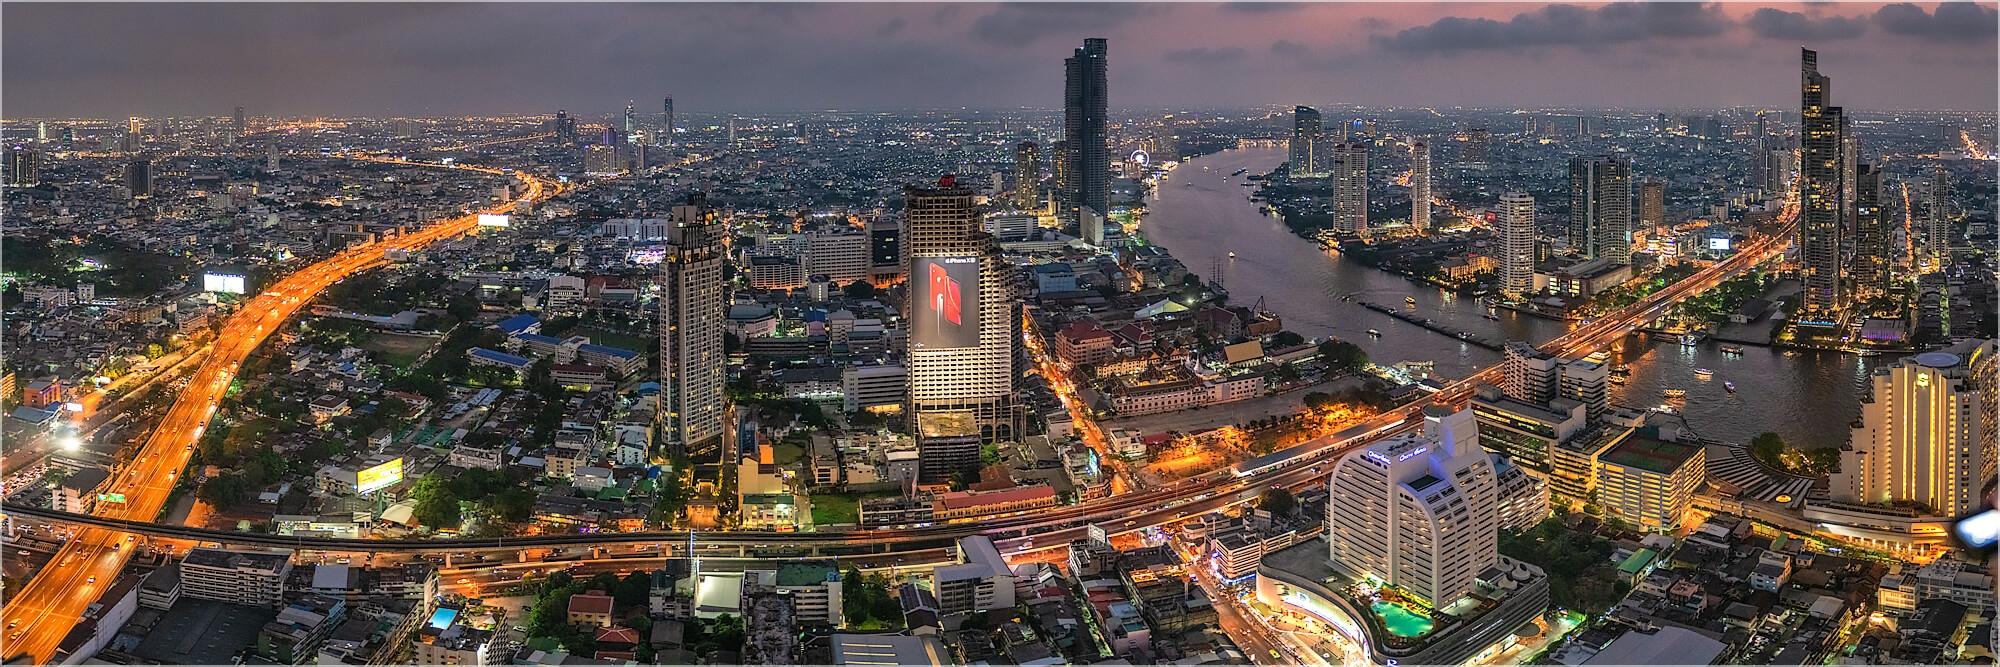 Panoramabild Skyline Stadtlandschaft Bangkok